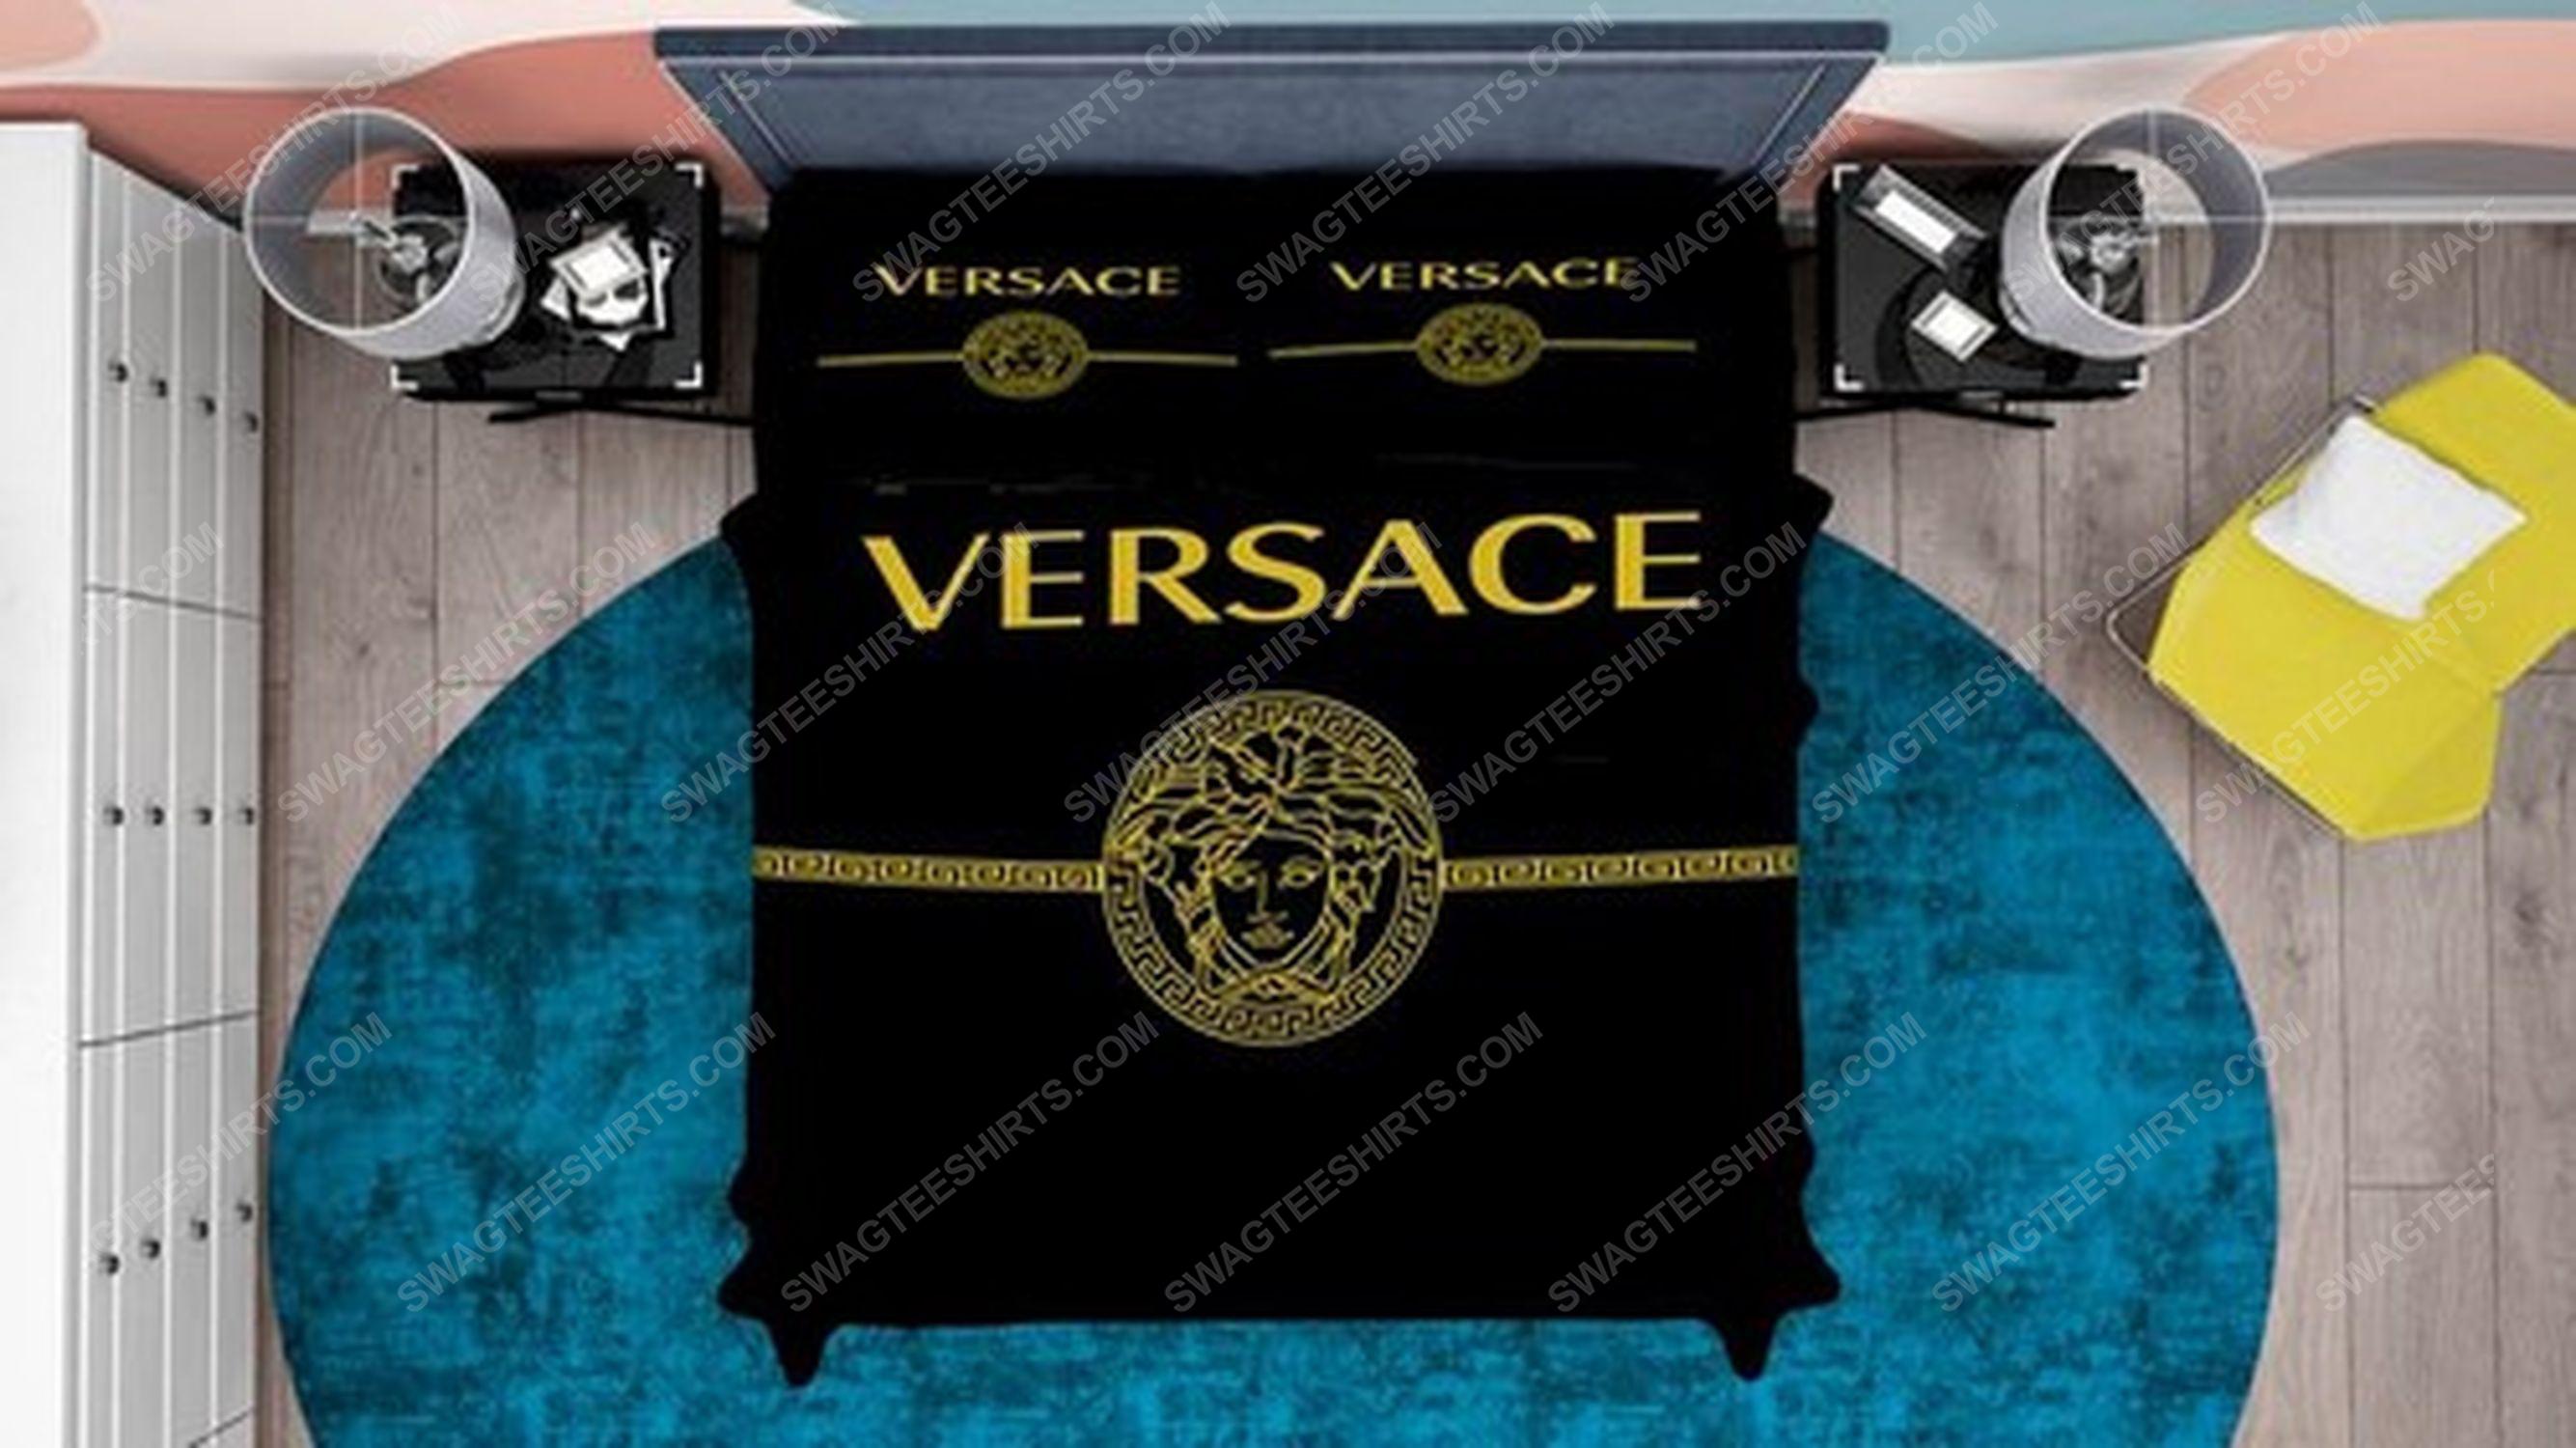 Versace black and gold full print duvet cover bedding set 2